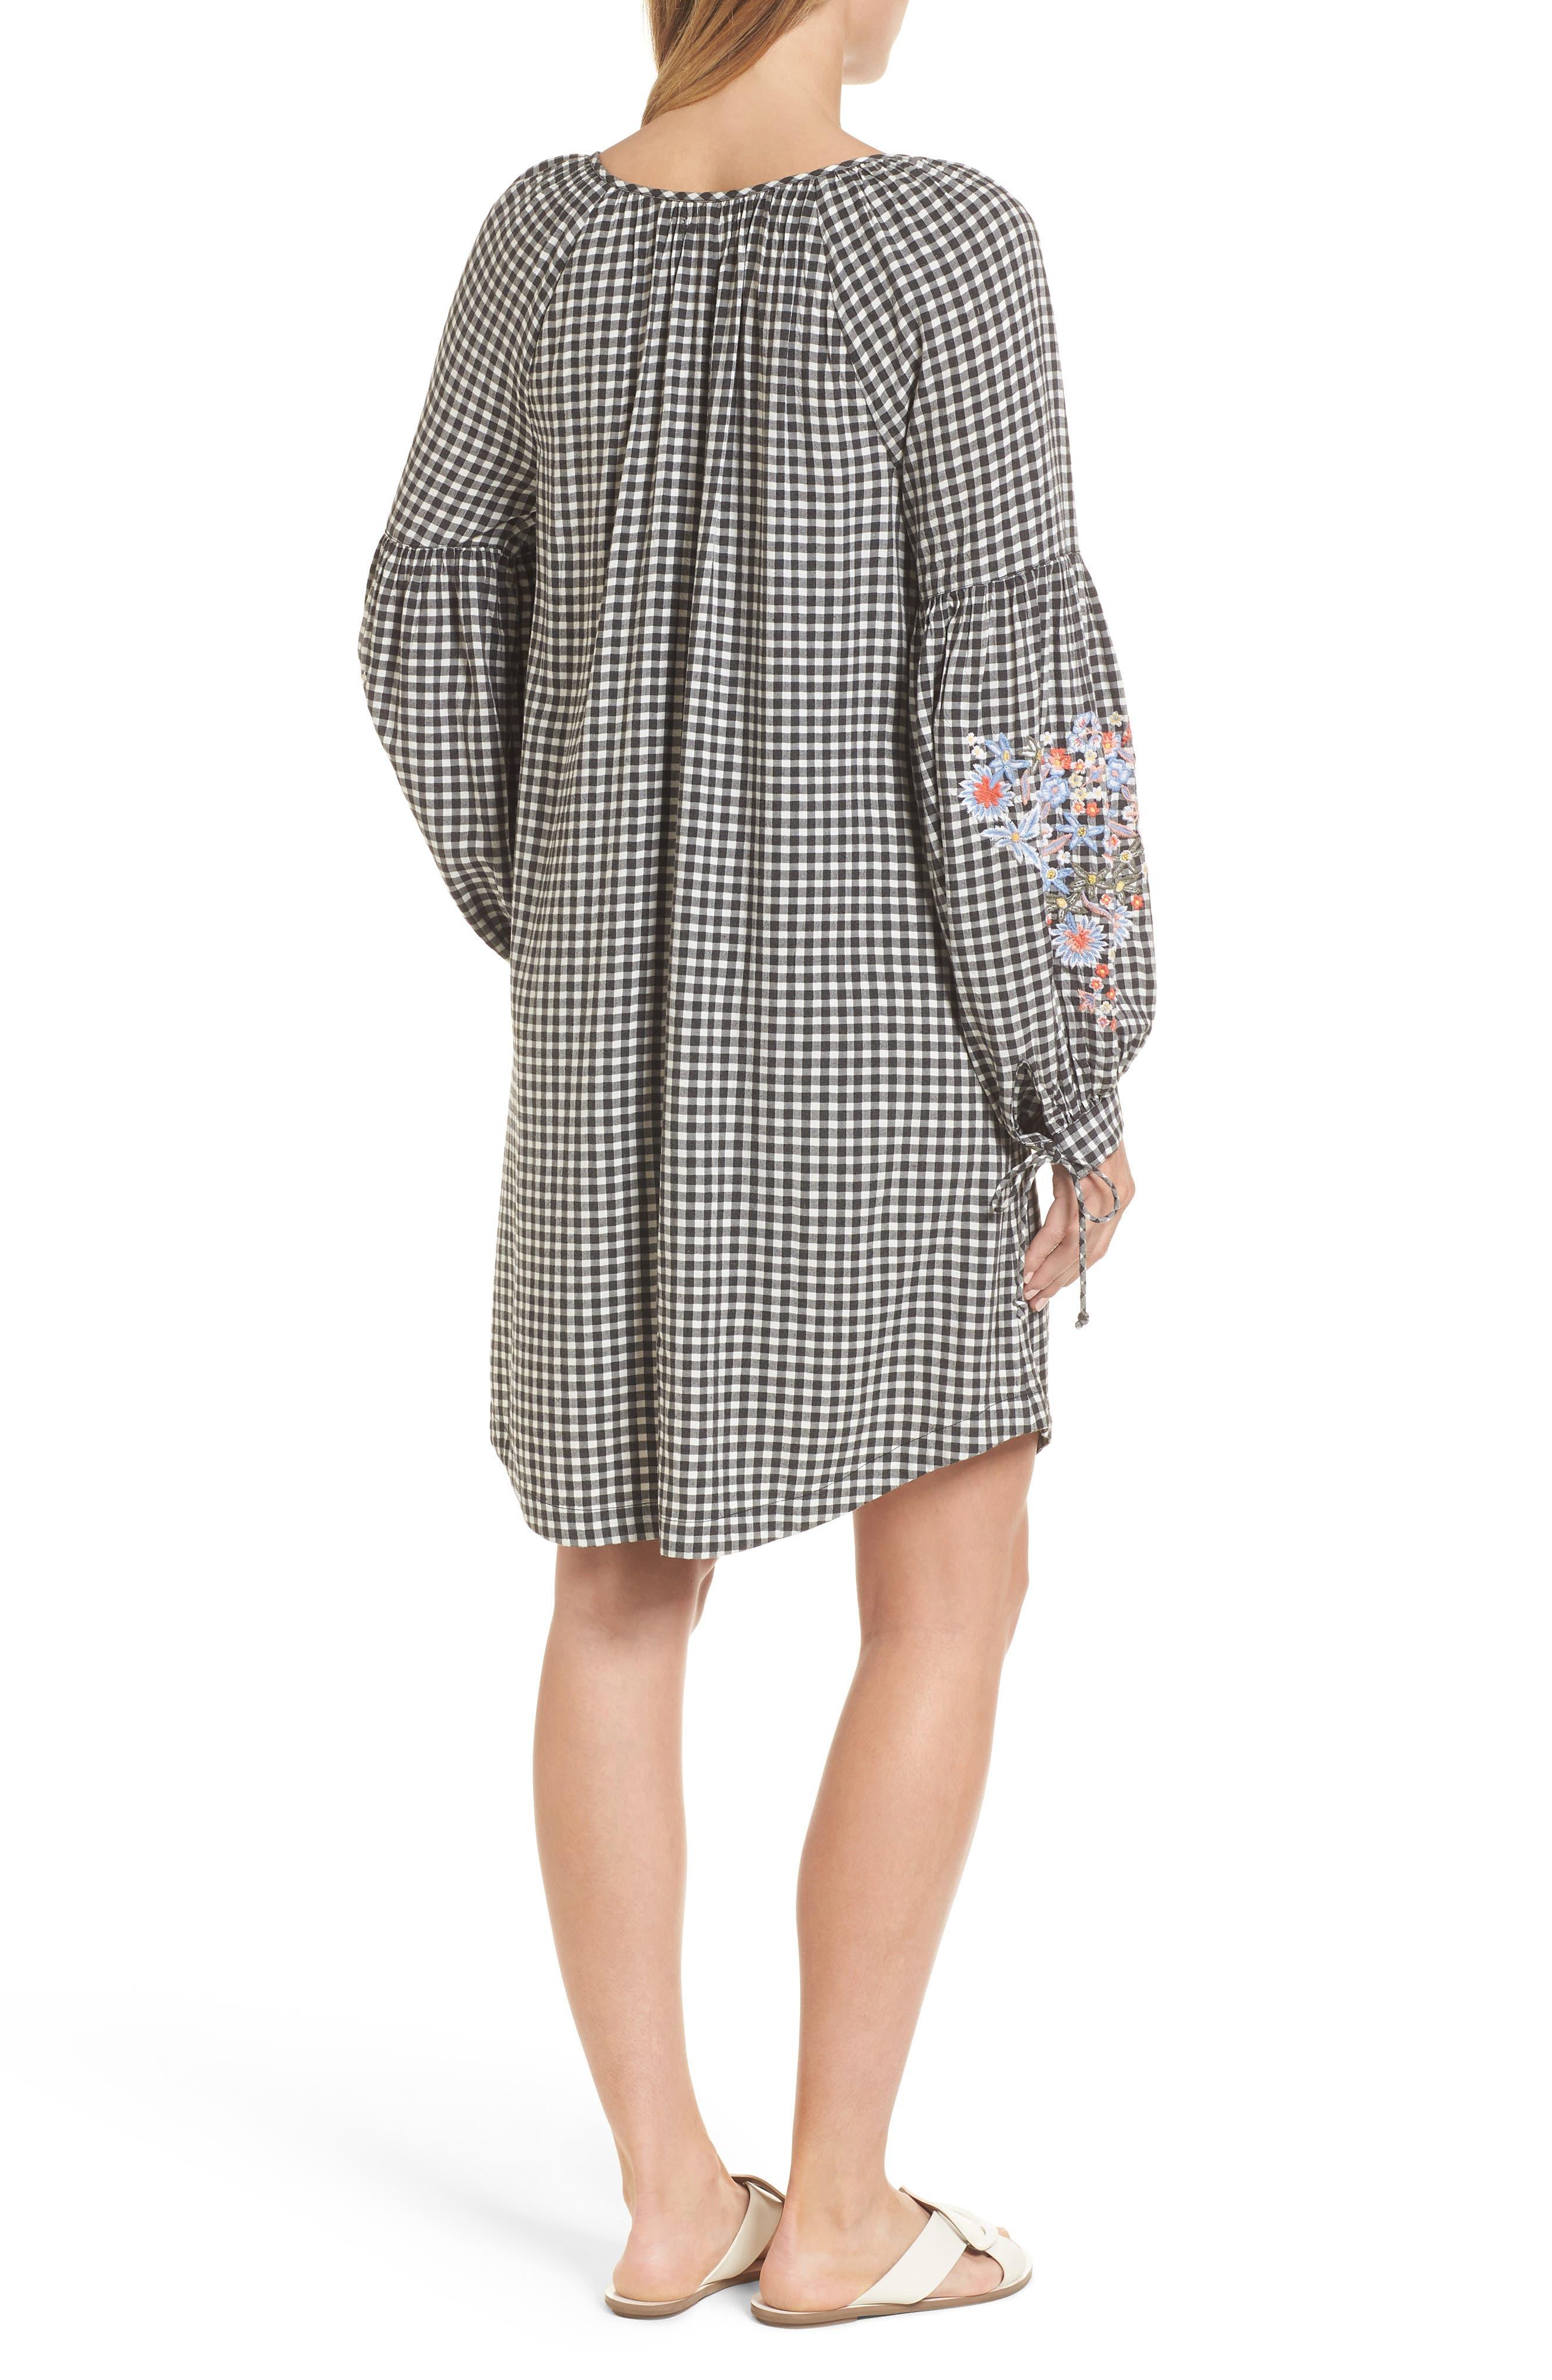 Embroidered Sleeve Shift Dress,                             Alternate thumbnail 2, color,                             Black-White Gingham